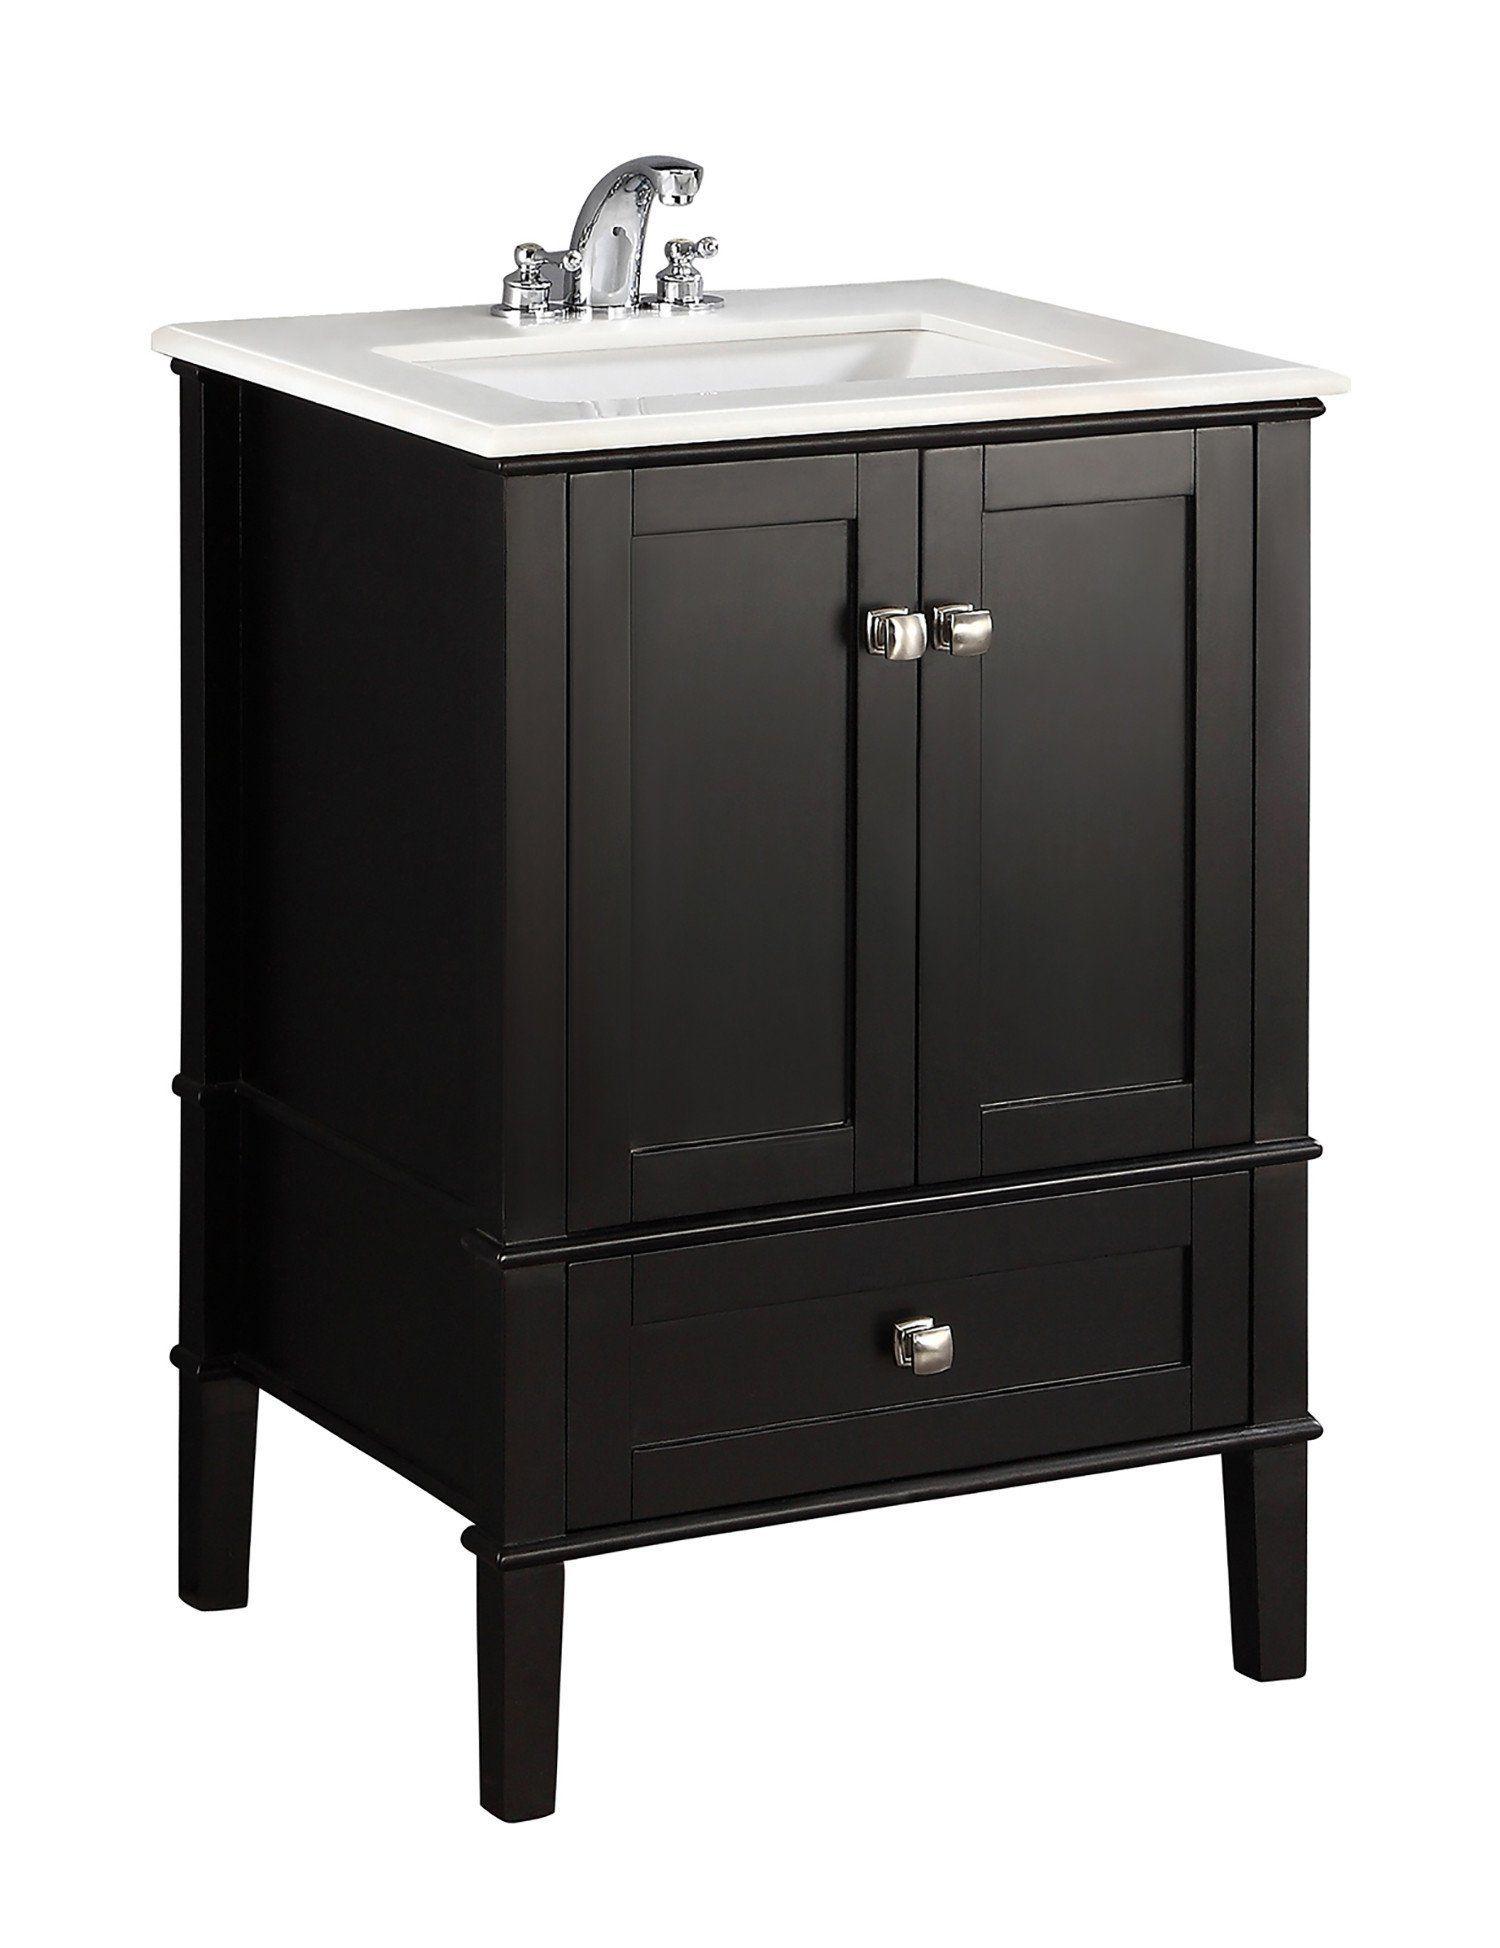 Chelsea 24 Inch Bath Vanity With White Engineered Quartz Marble